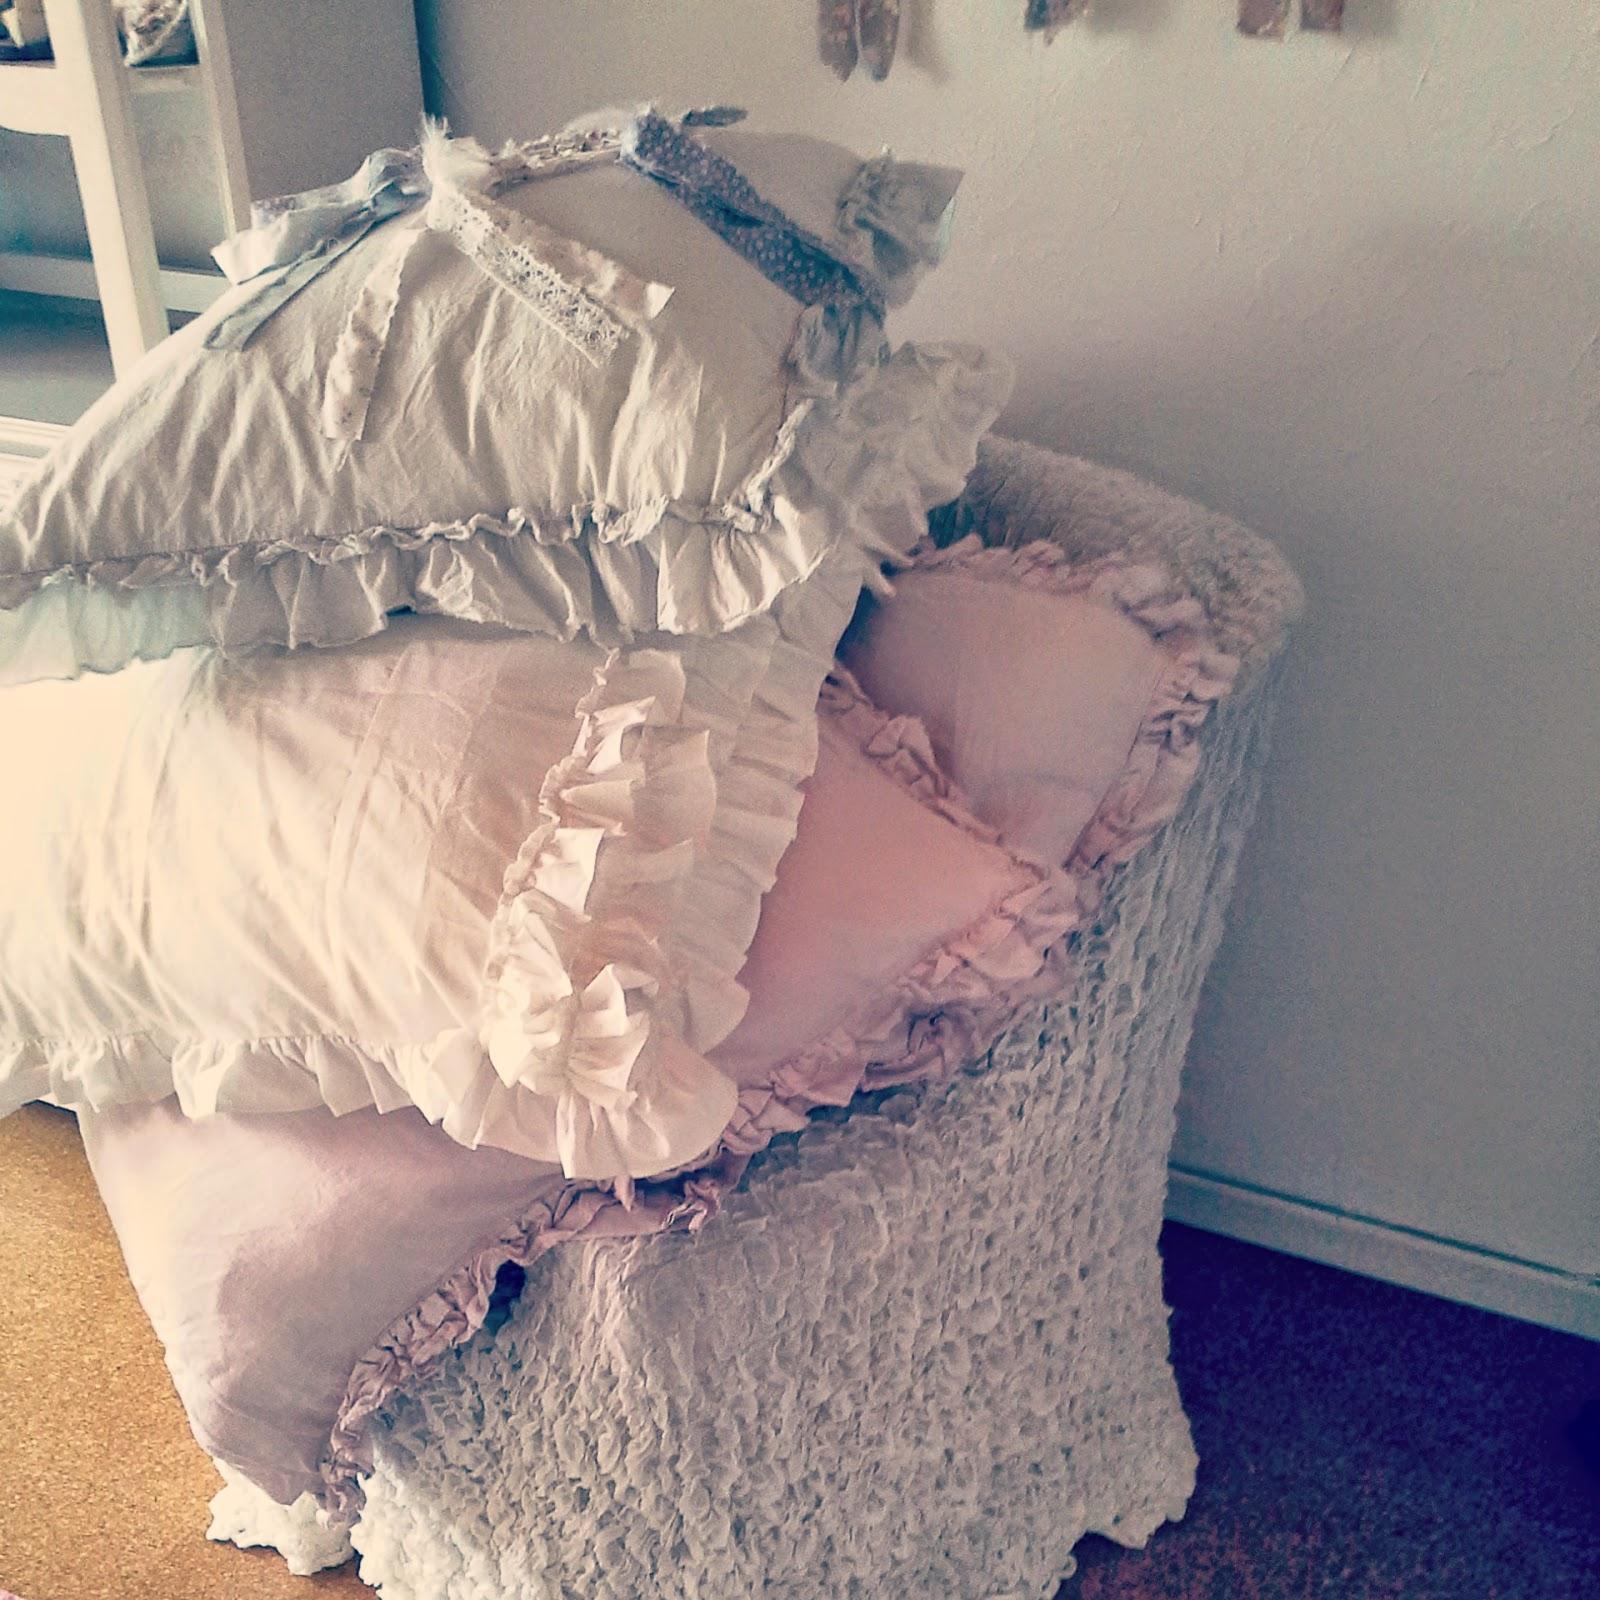 shabby chic kissen kissenrolle shabby chic kissen vintage nackenrolle ebay shabby chic kissen. Black Bedroom Furniture Sets. Home Design Ideas